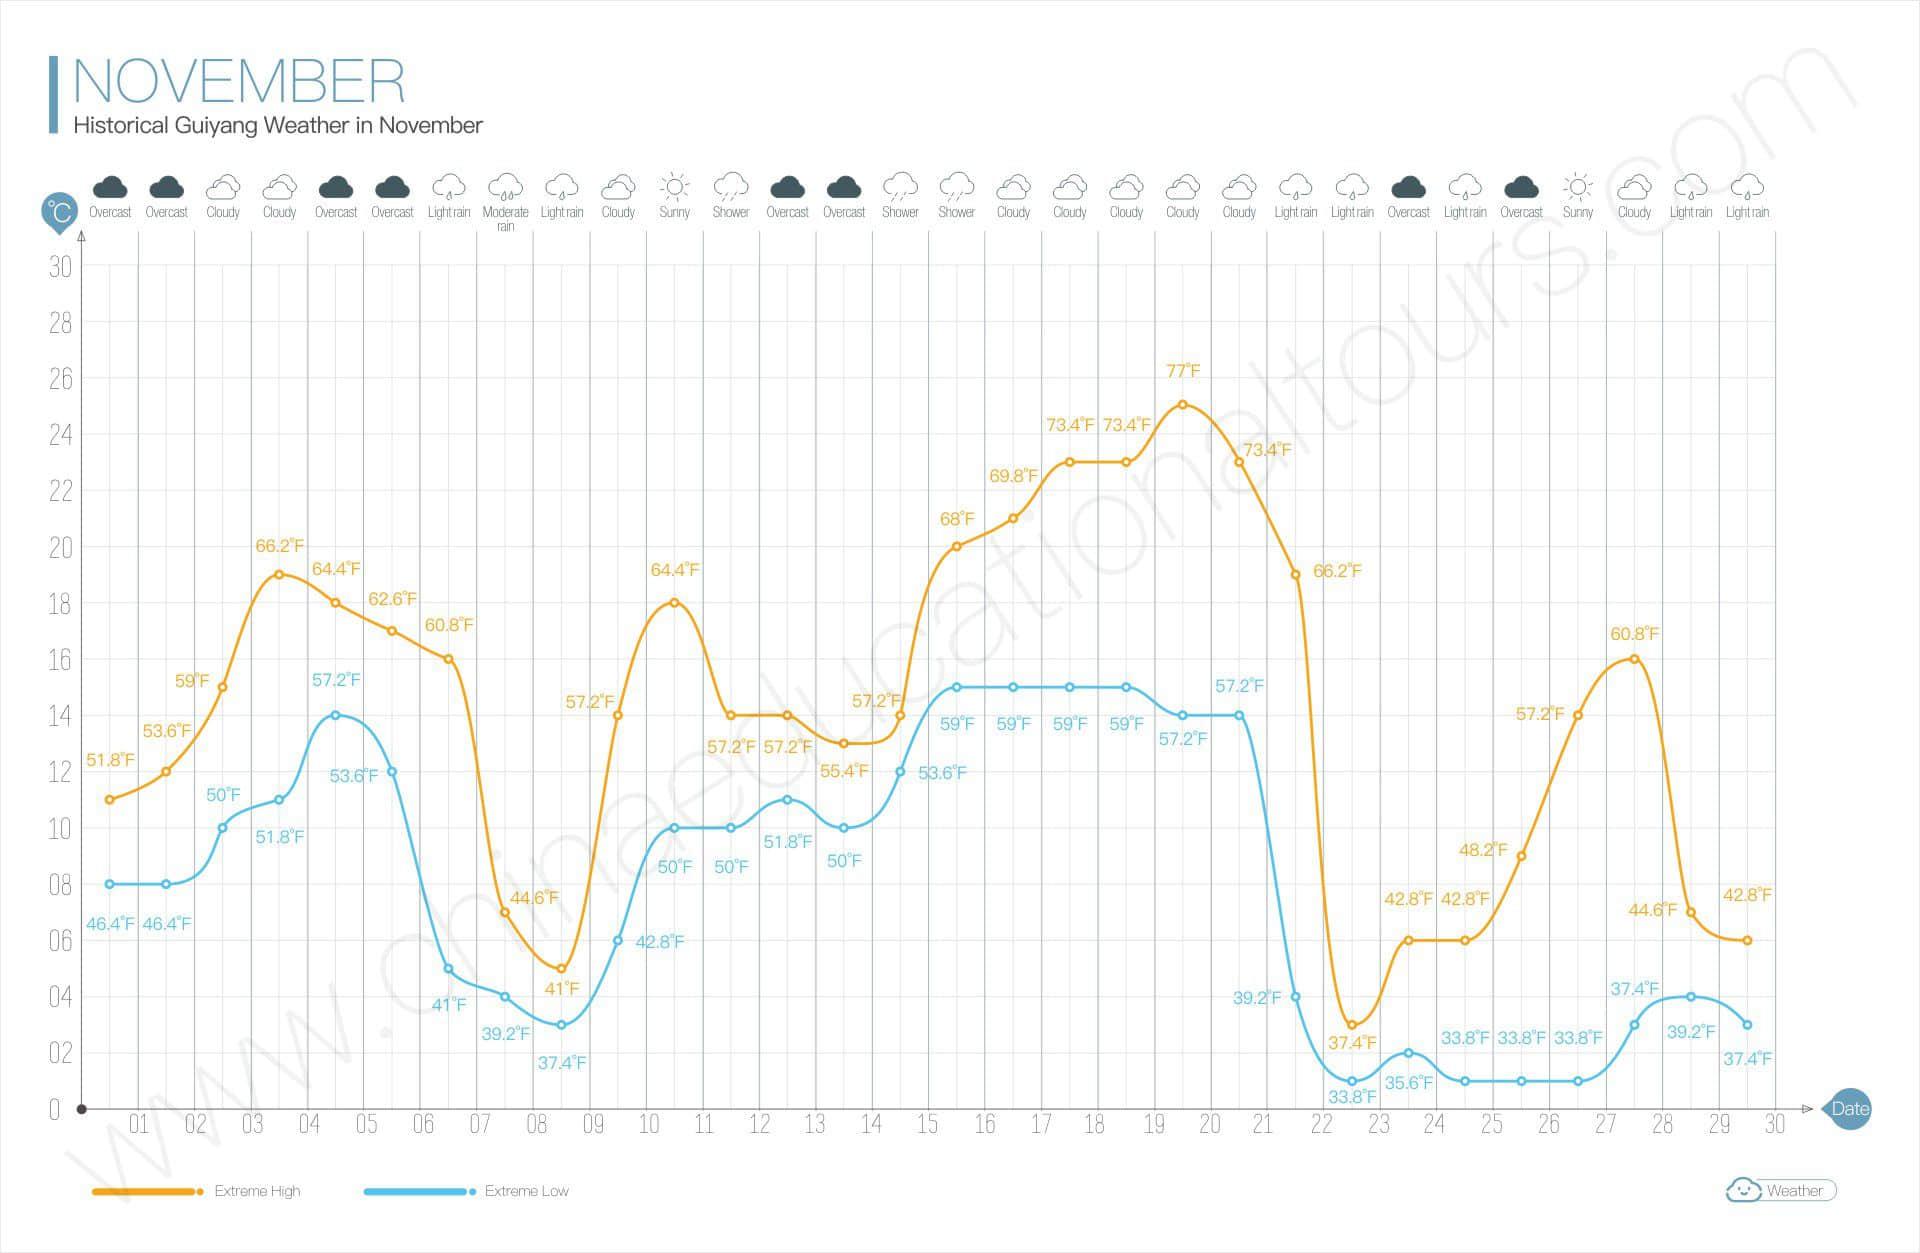 historical guiyang weather in november